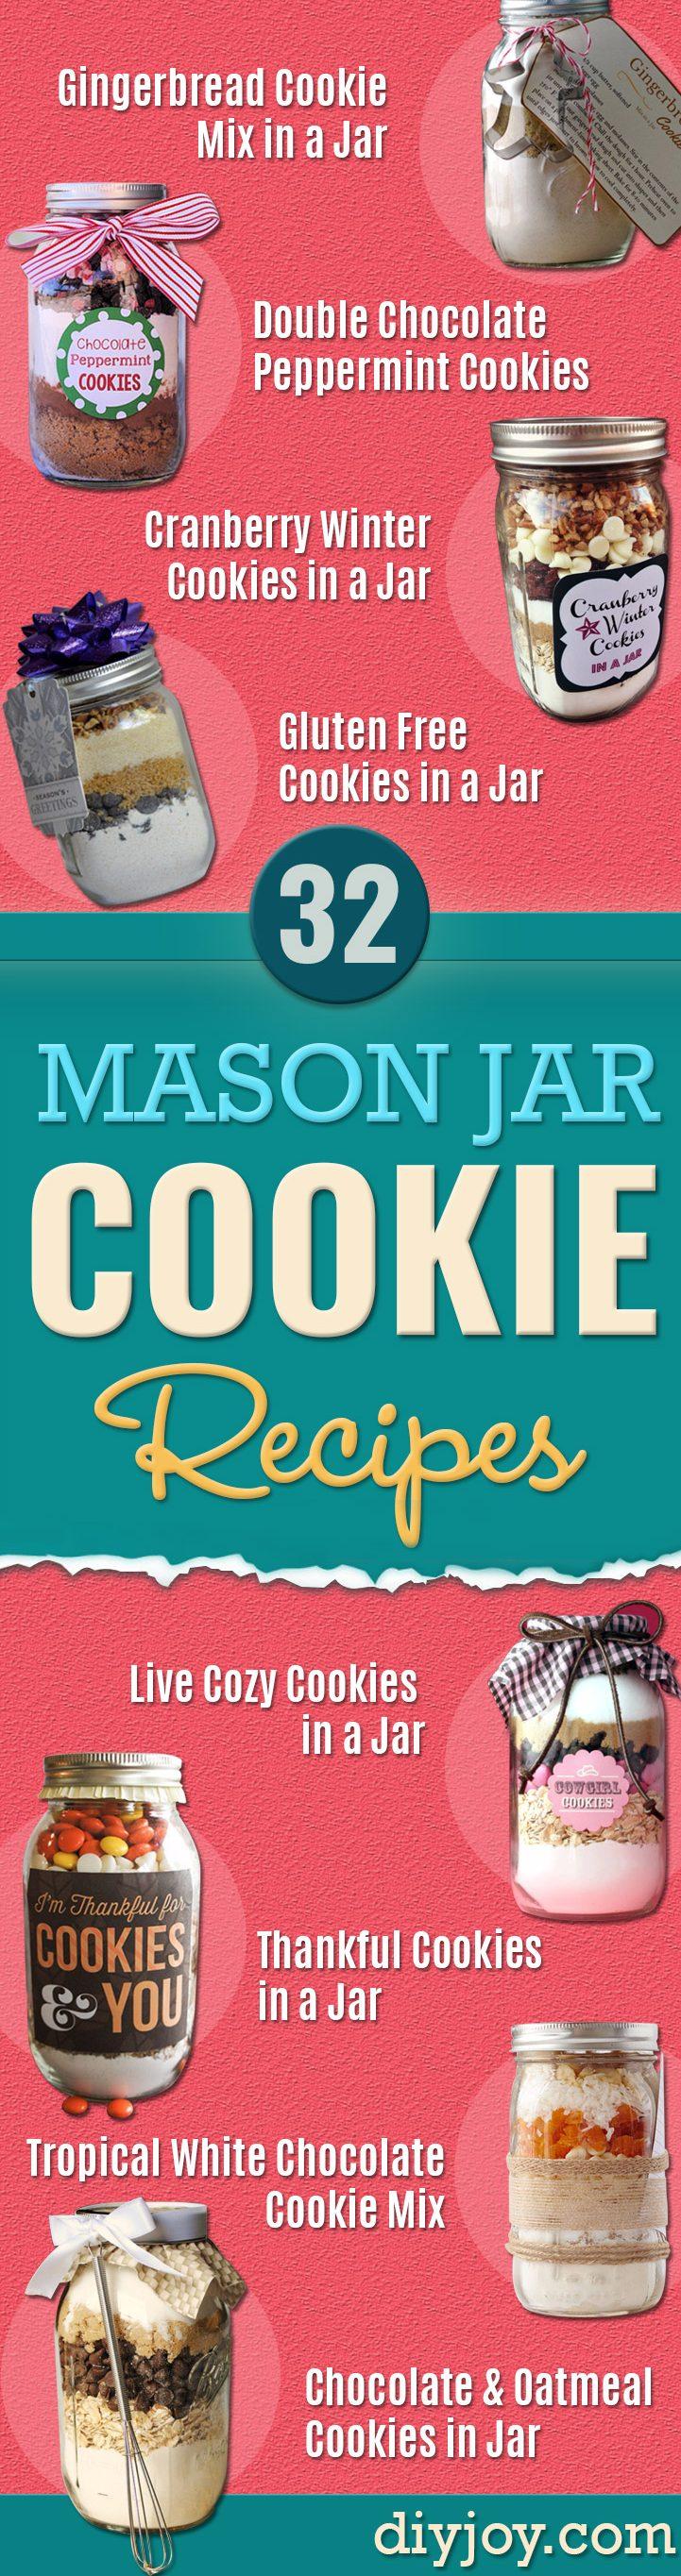 32 Mason Jar Cookie Recipes